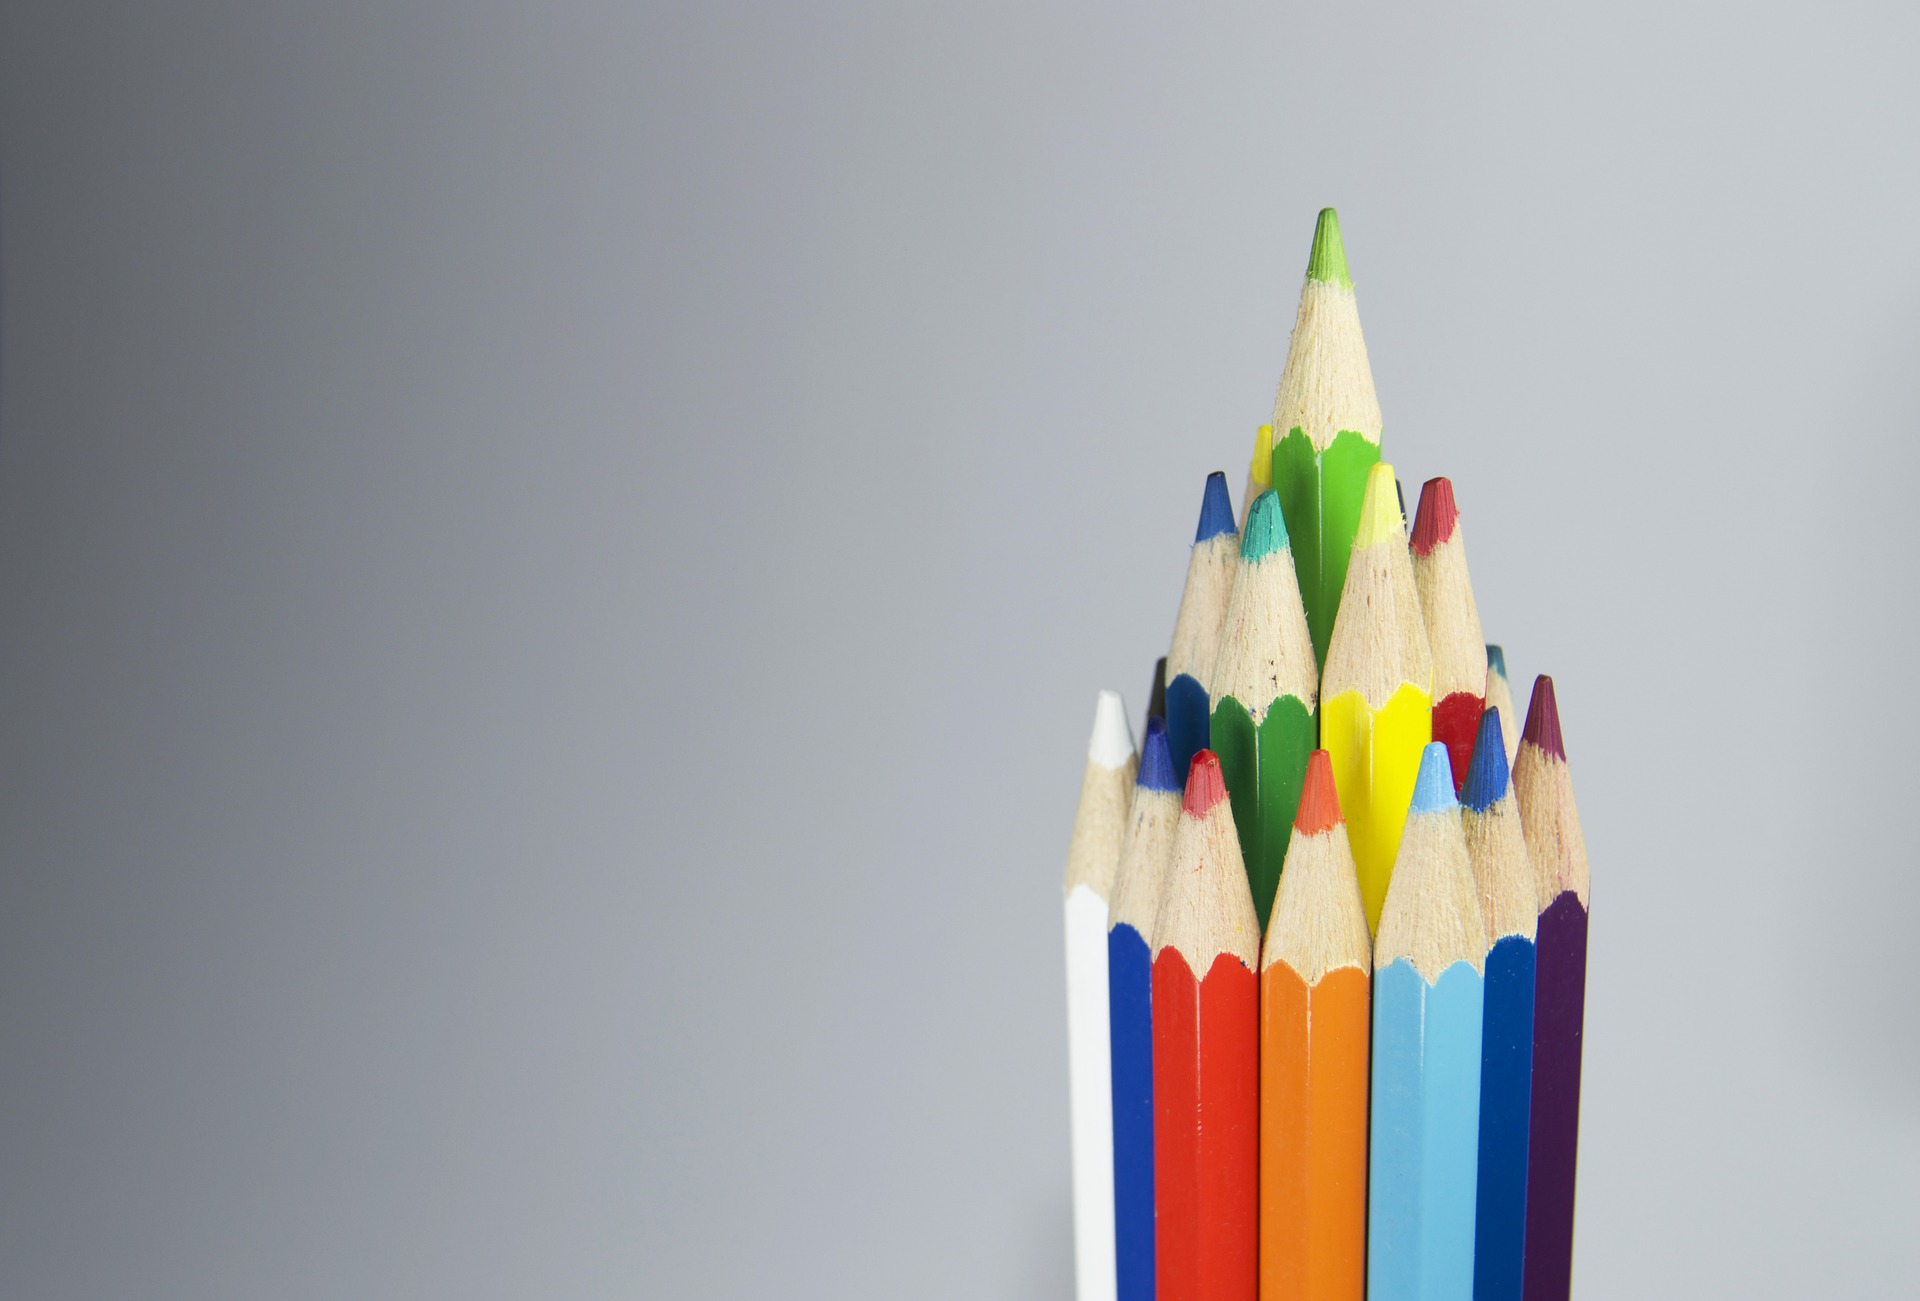 lápices, madera, colores, pirámide, cúspide - Fondos de Pantalla HD - professor-falken.com